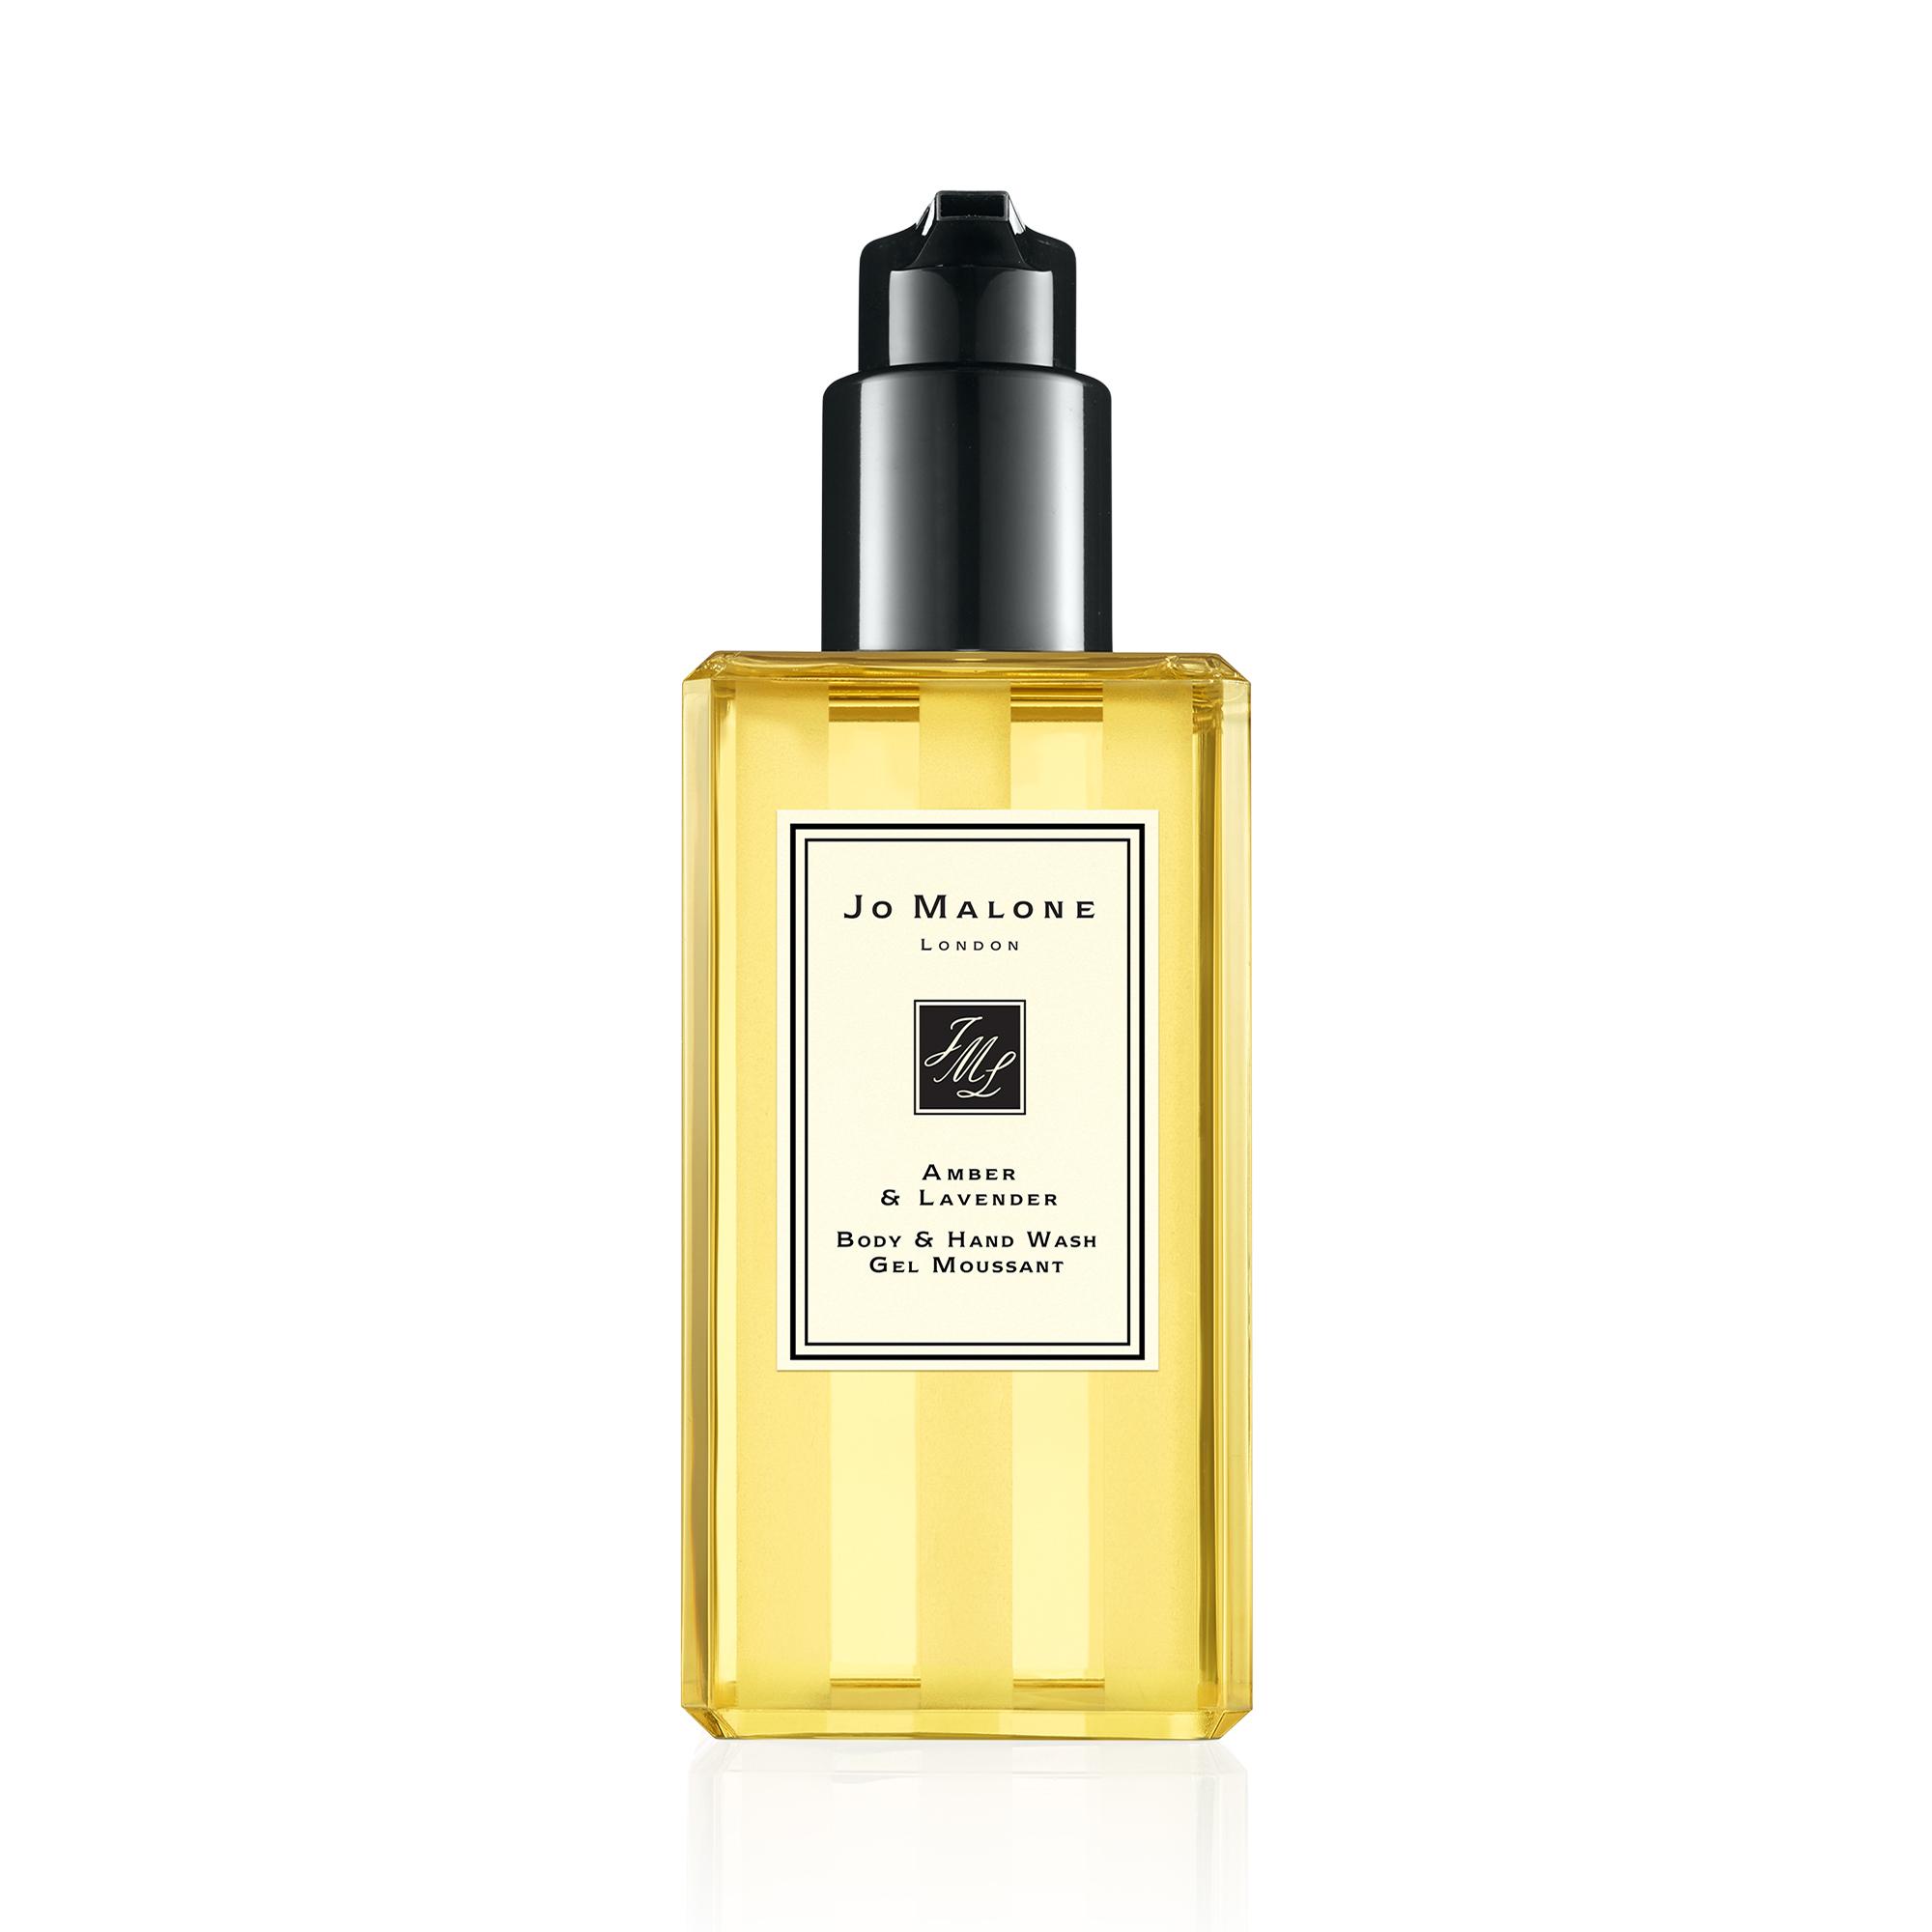 Amber & Lavender Body & Hand Wash 250ML